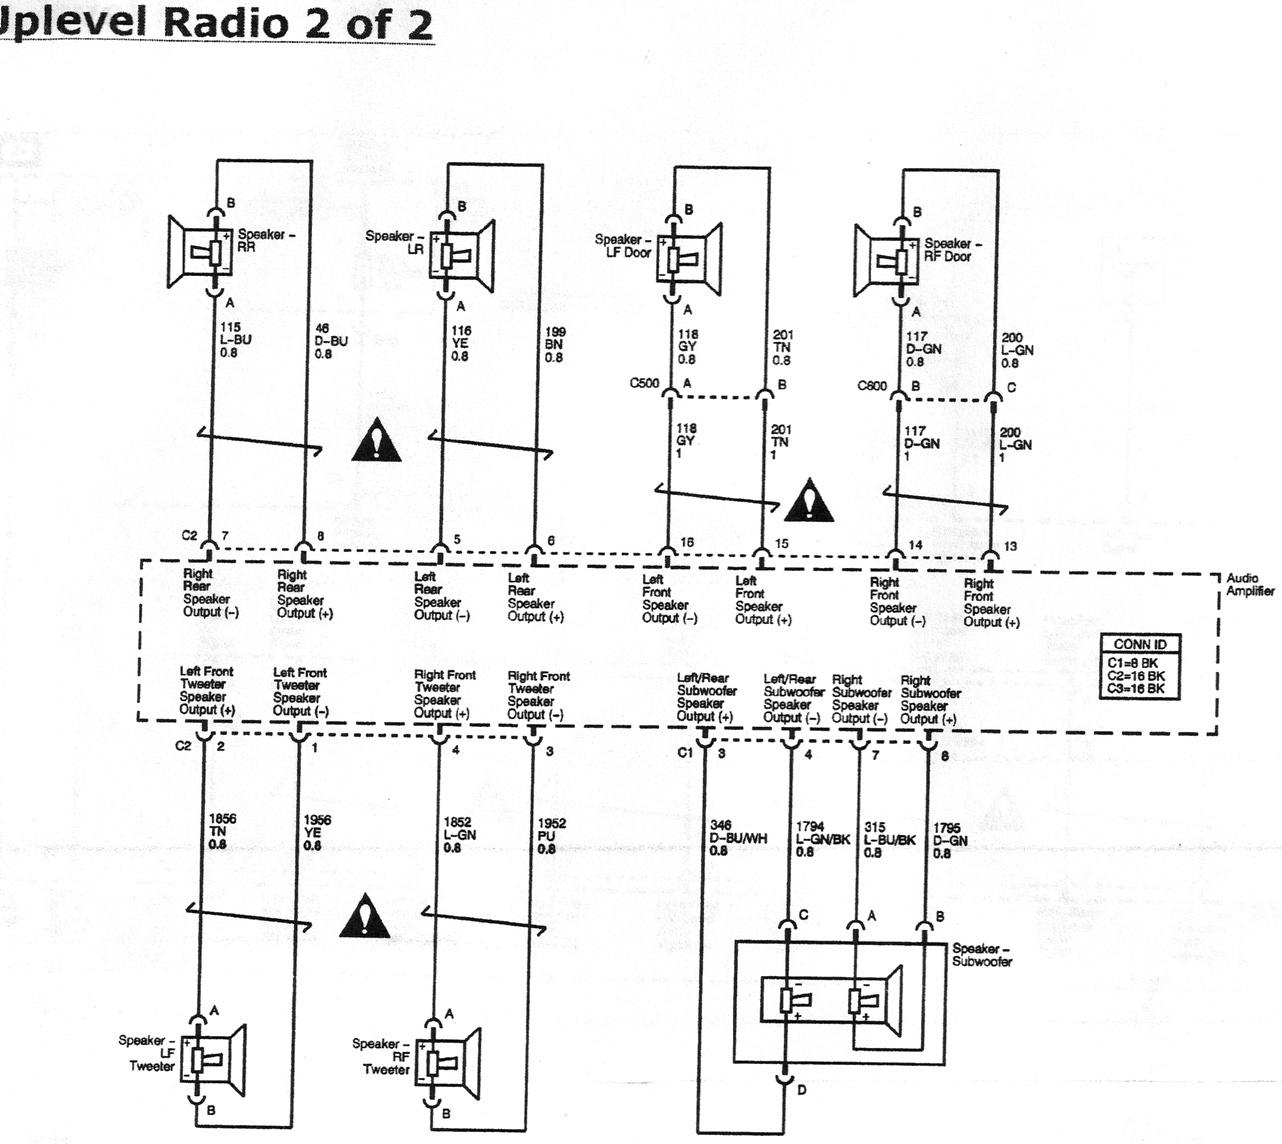 2001 Vw Monsoon Radio Wiring Diagram Hd Quality Er Diagram Altalangaleader It